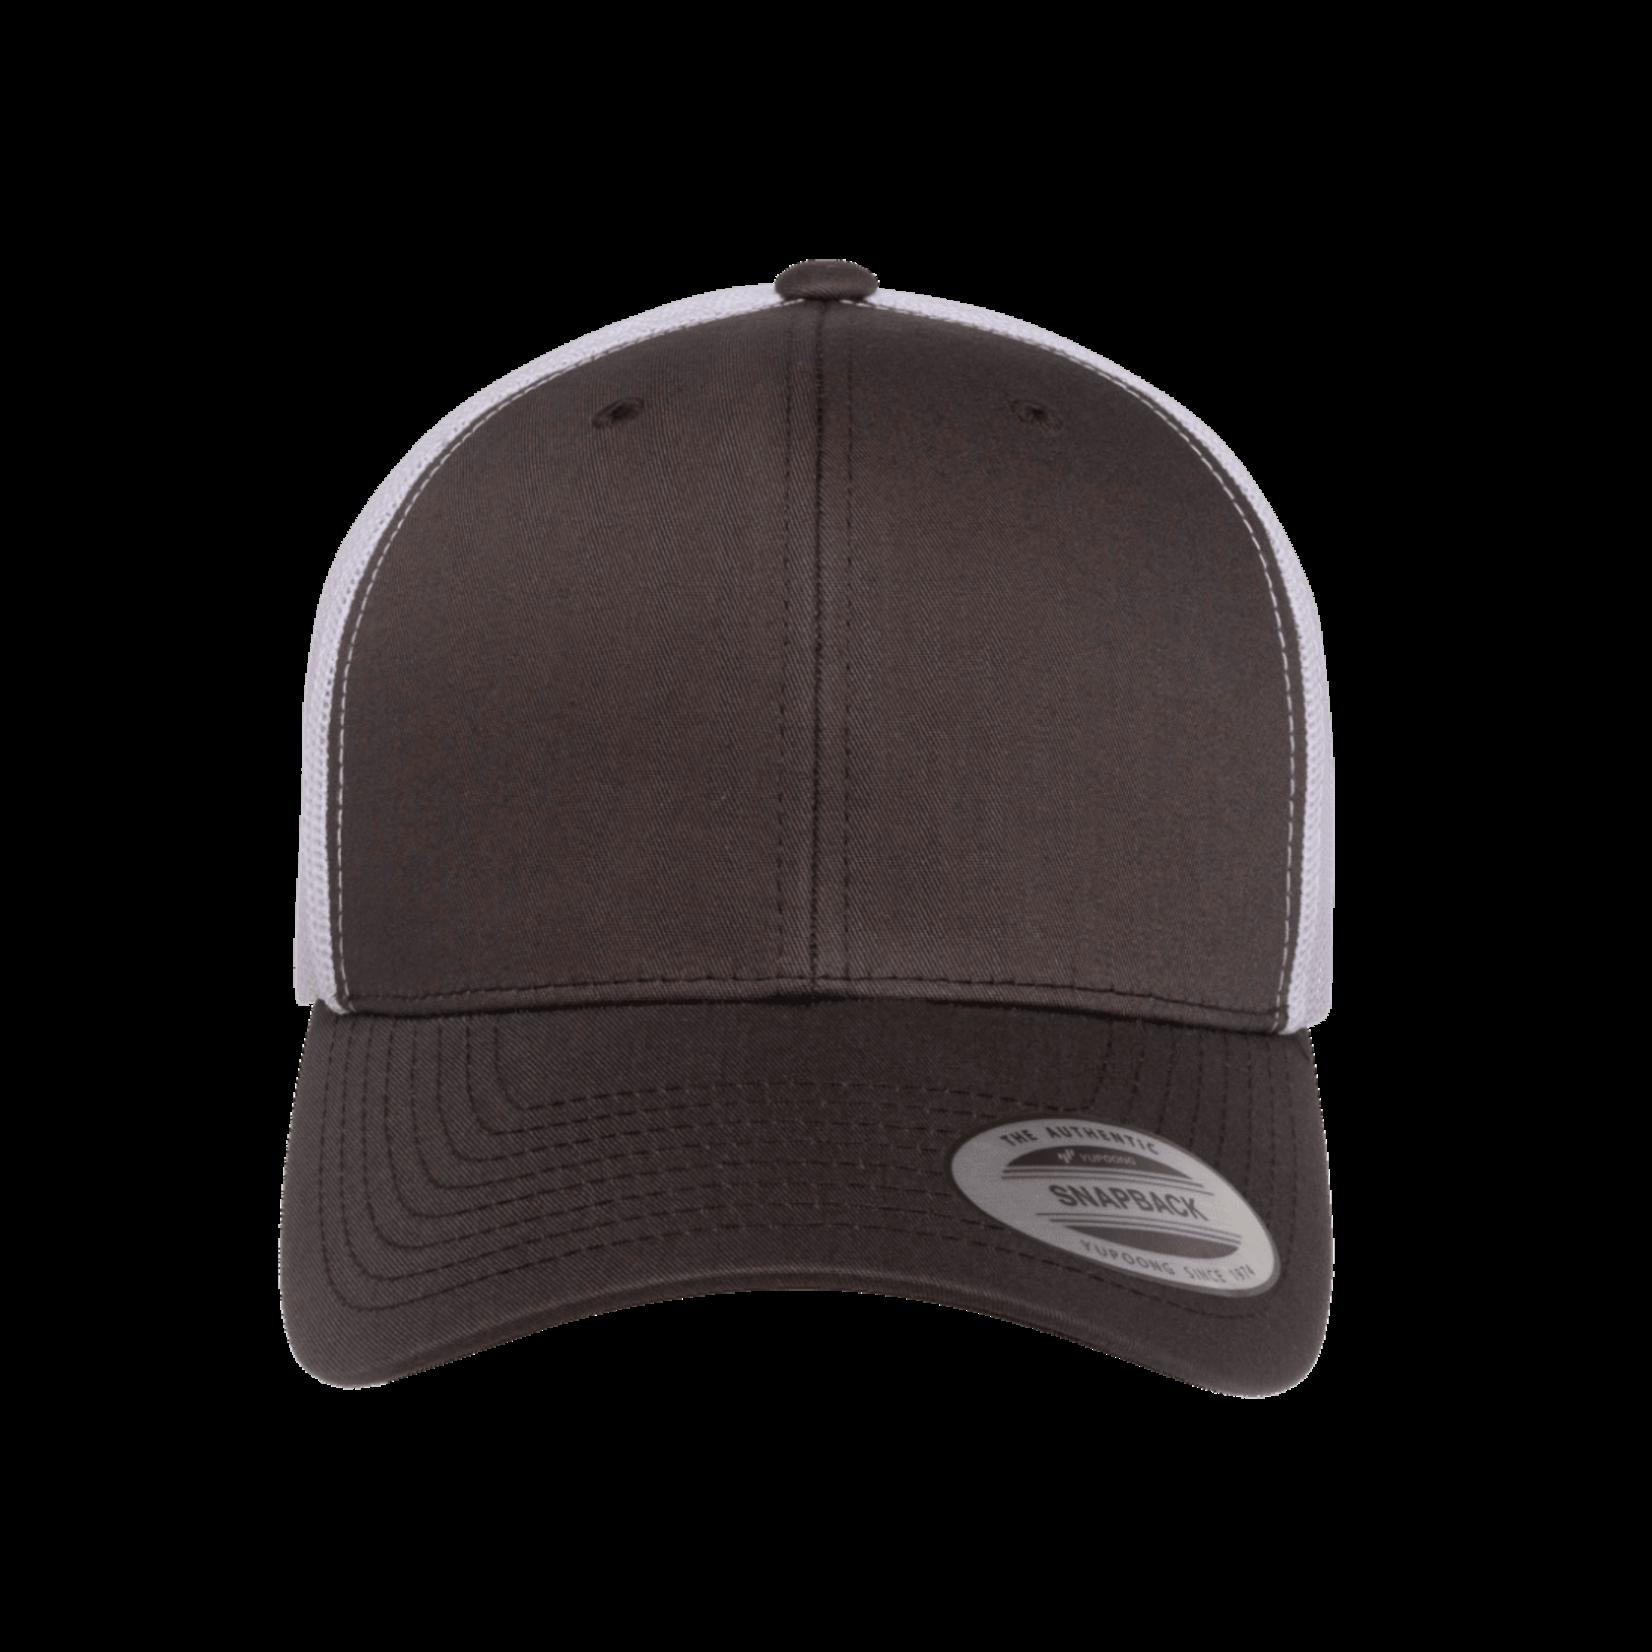 Flexfit Flexfit 6606T 2-Tone Snapback Trucker Hat - Charcoal/White